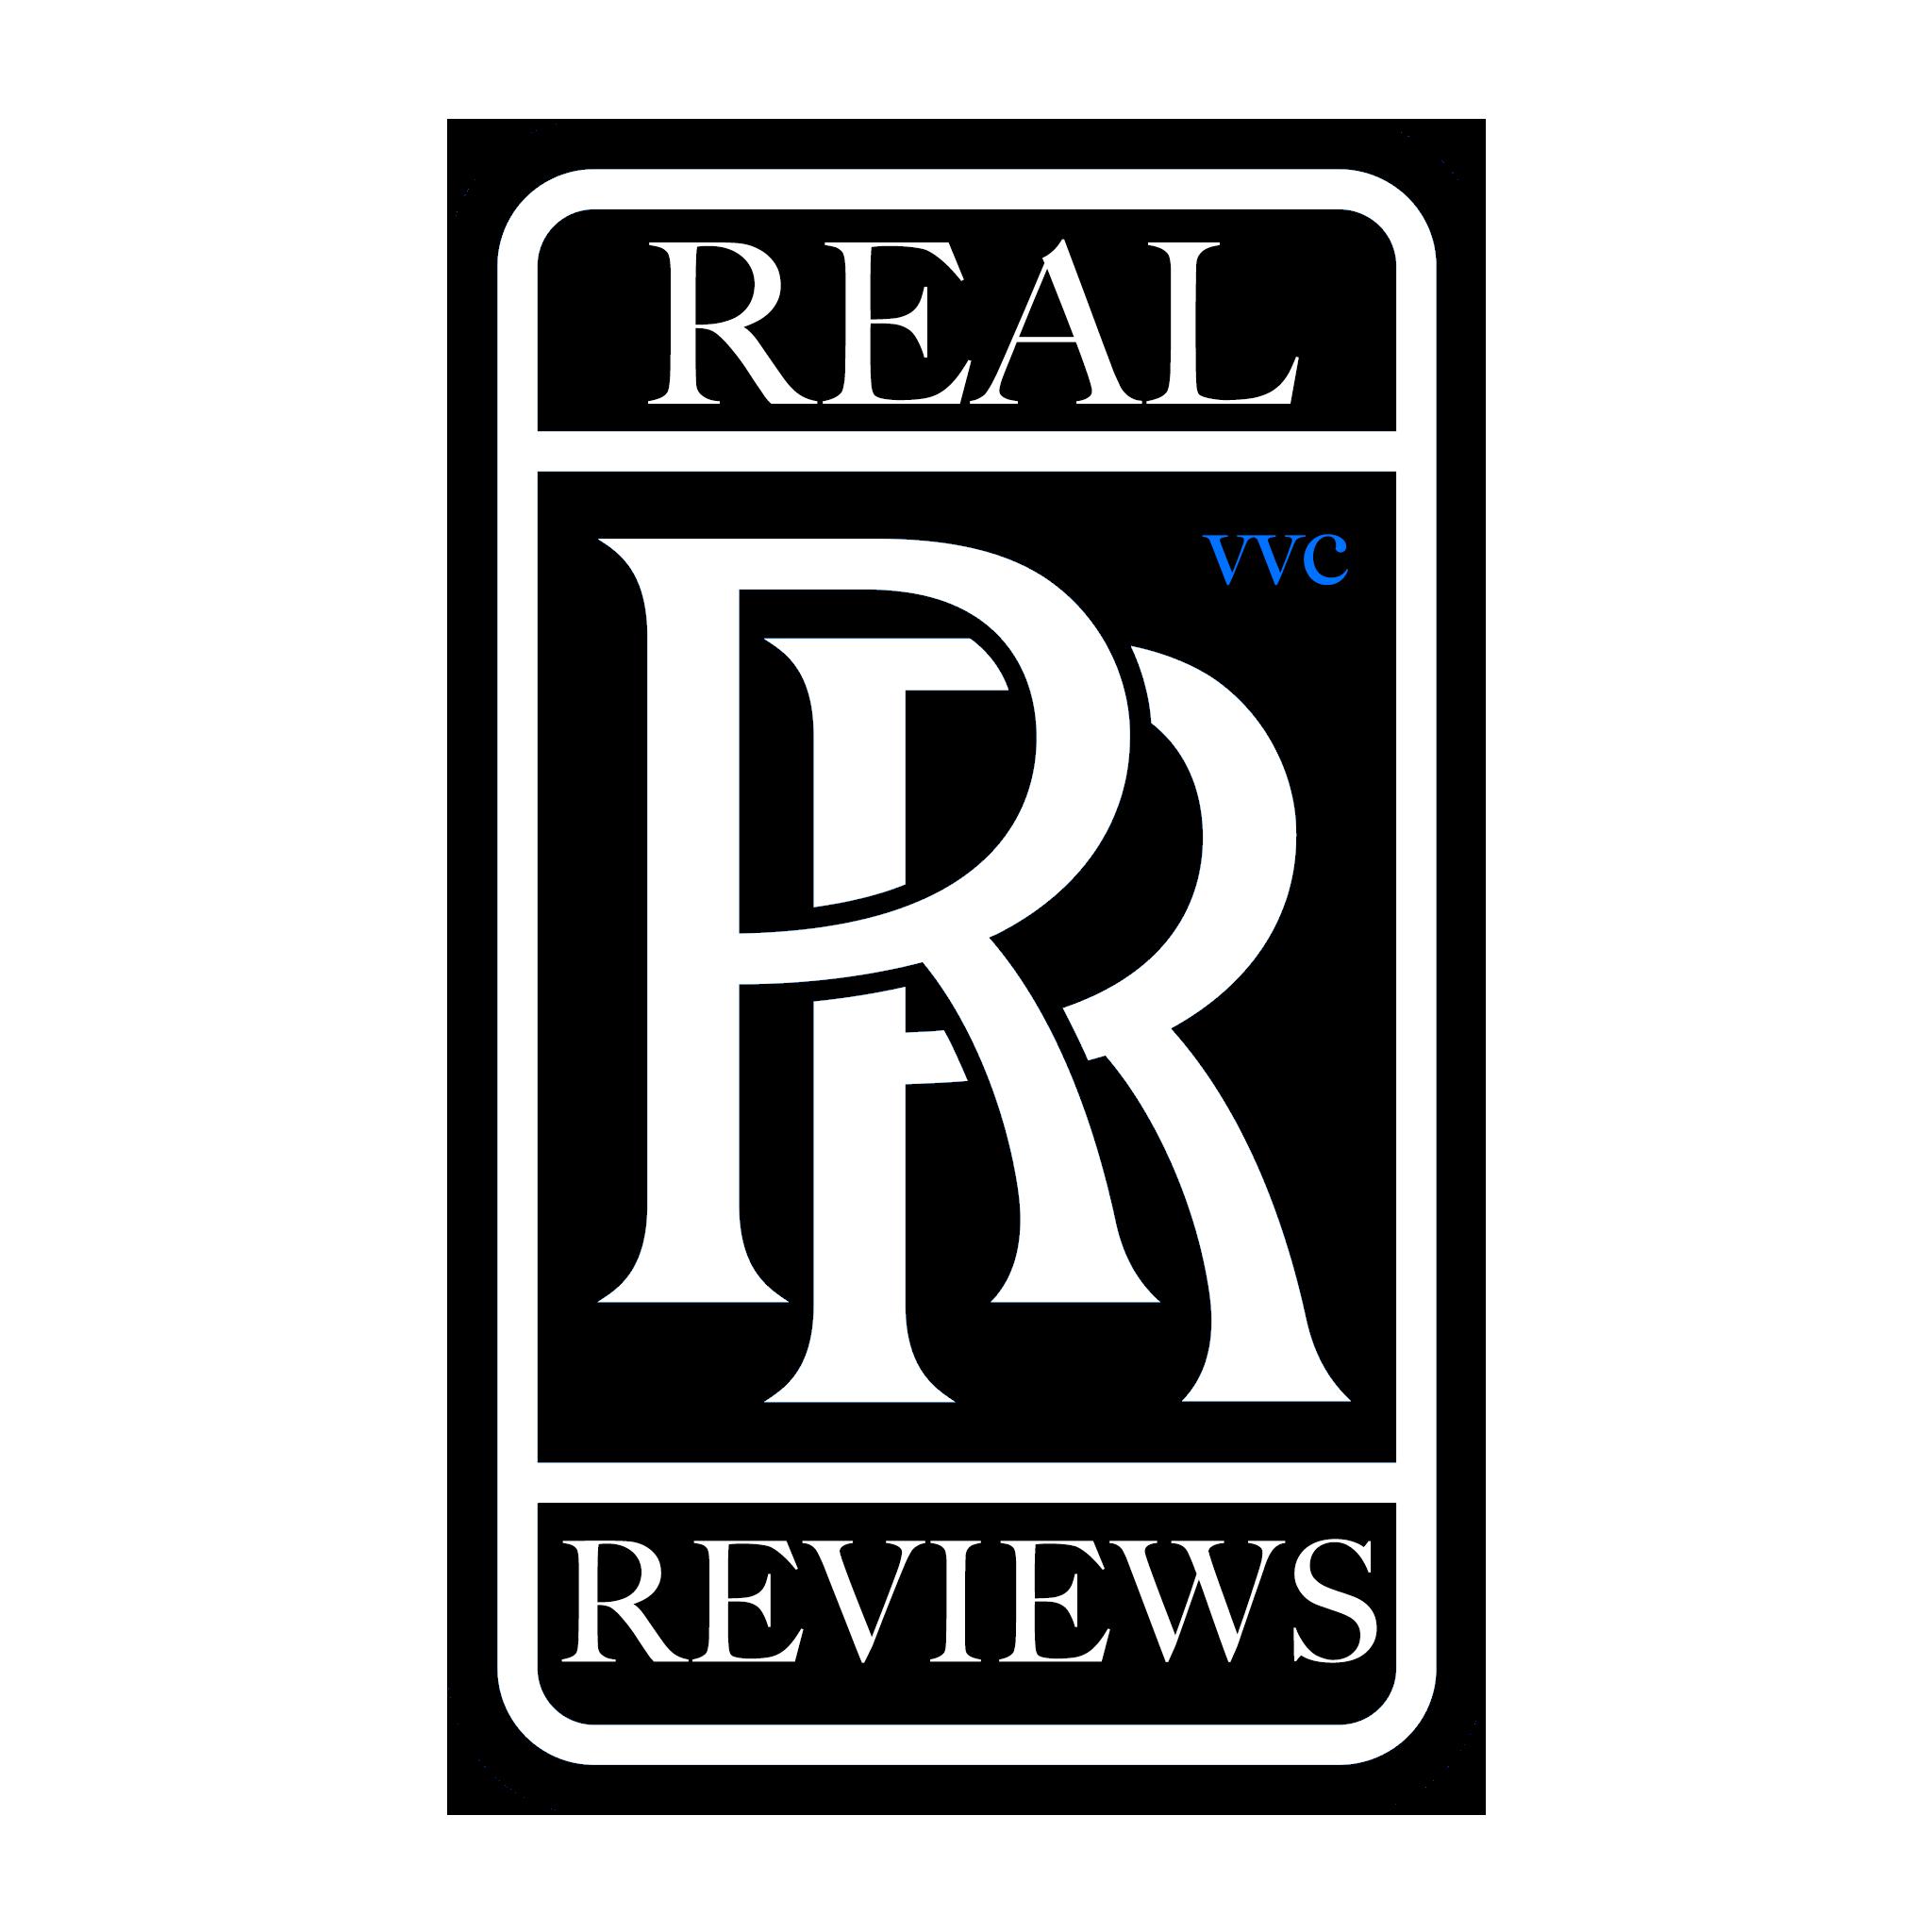 Real Reviews: Cardi B, Rich Homie Quan, DJ Esco, The Weeknd, rich